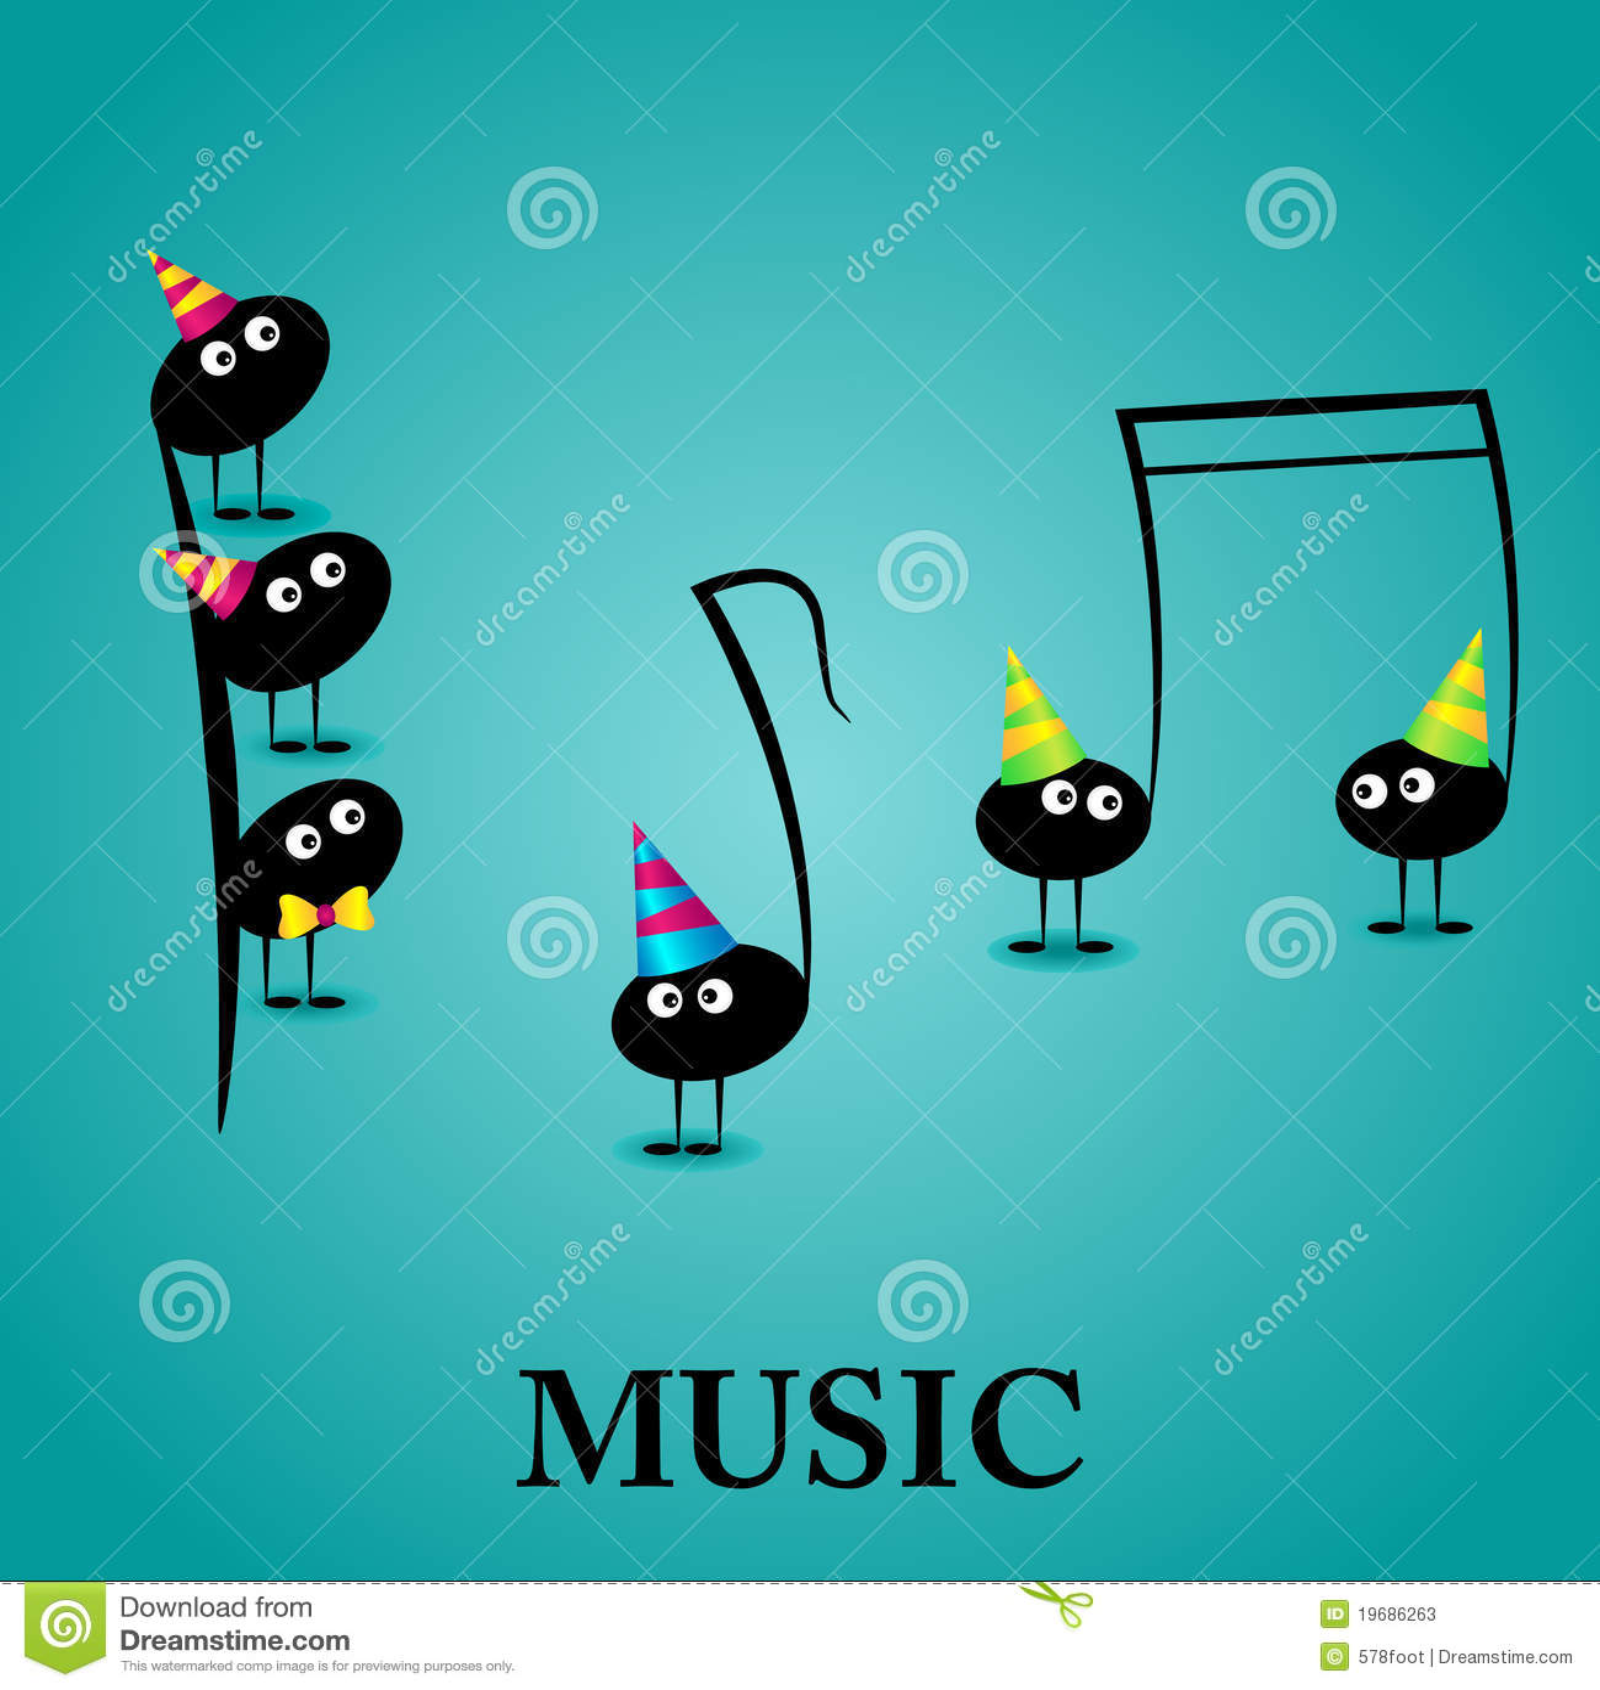 Musical Greeting Card Stock Photos - Image: 19686263